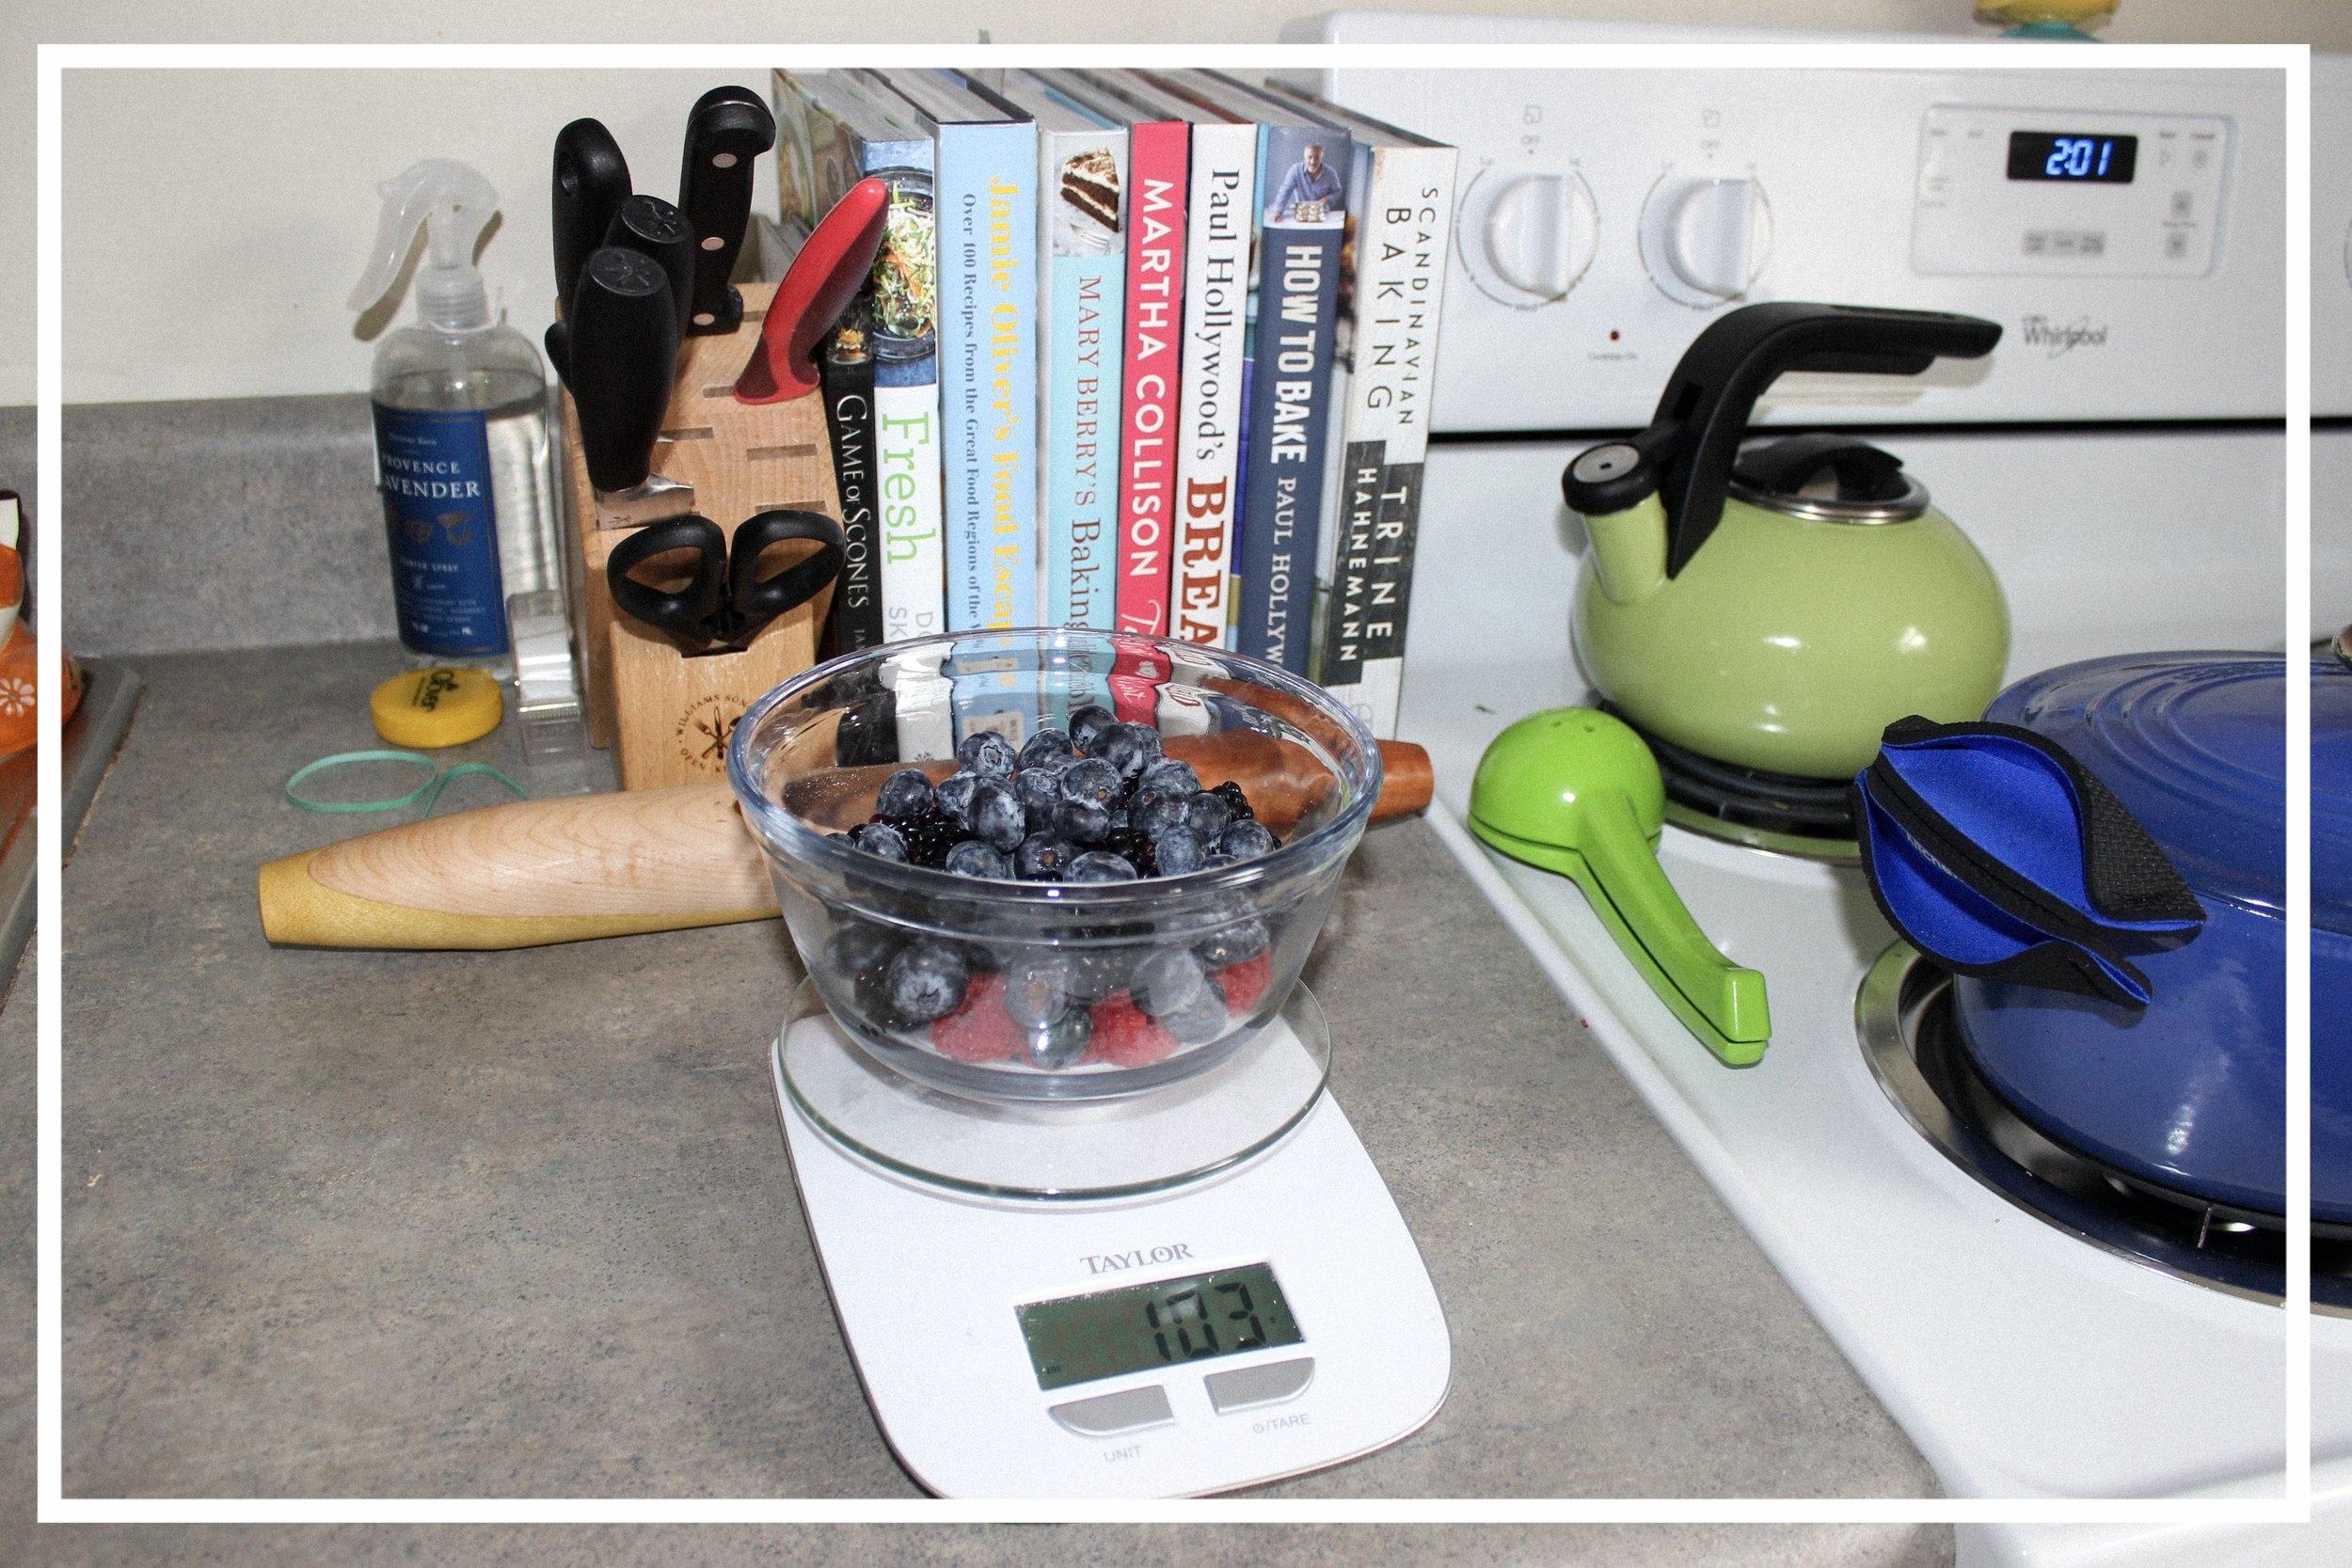 Mereberry Jam - 100 grams of Raspberries100 grams of Blueberries100 grams of Strawberries, chopped small100 grams of Blackberries325 grams of granulated or jam sugarJuice of ½ lemon (make sure seeds are removed)